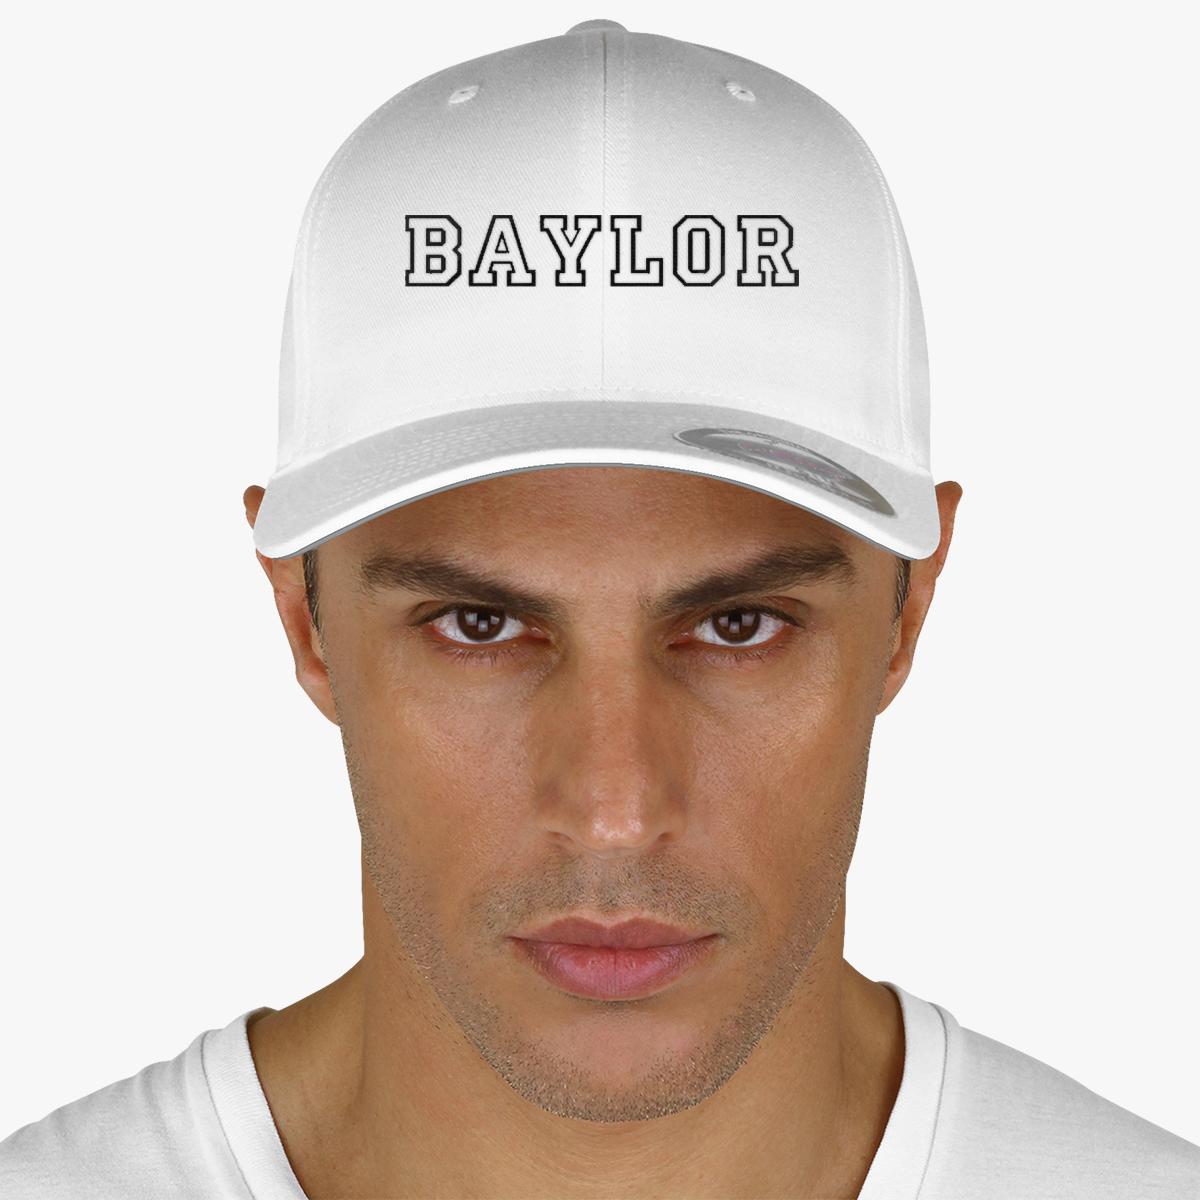 ... snapback team colors 4c689 c6eab buy baylor university baylor baseball  cap 949d5 e7ad4 ... b822da777